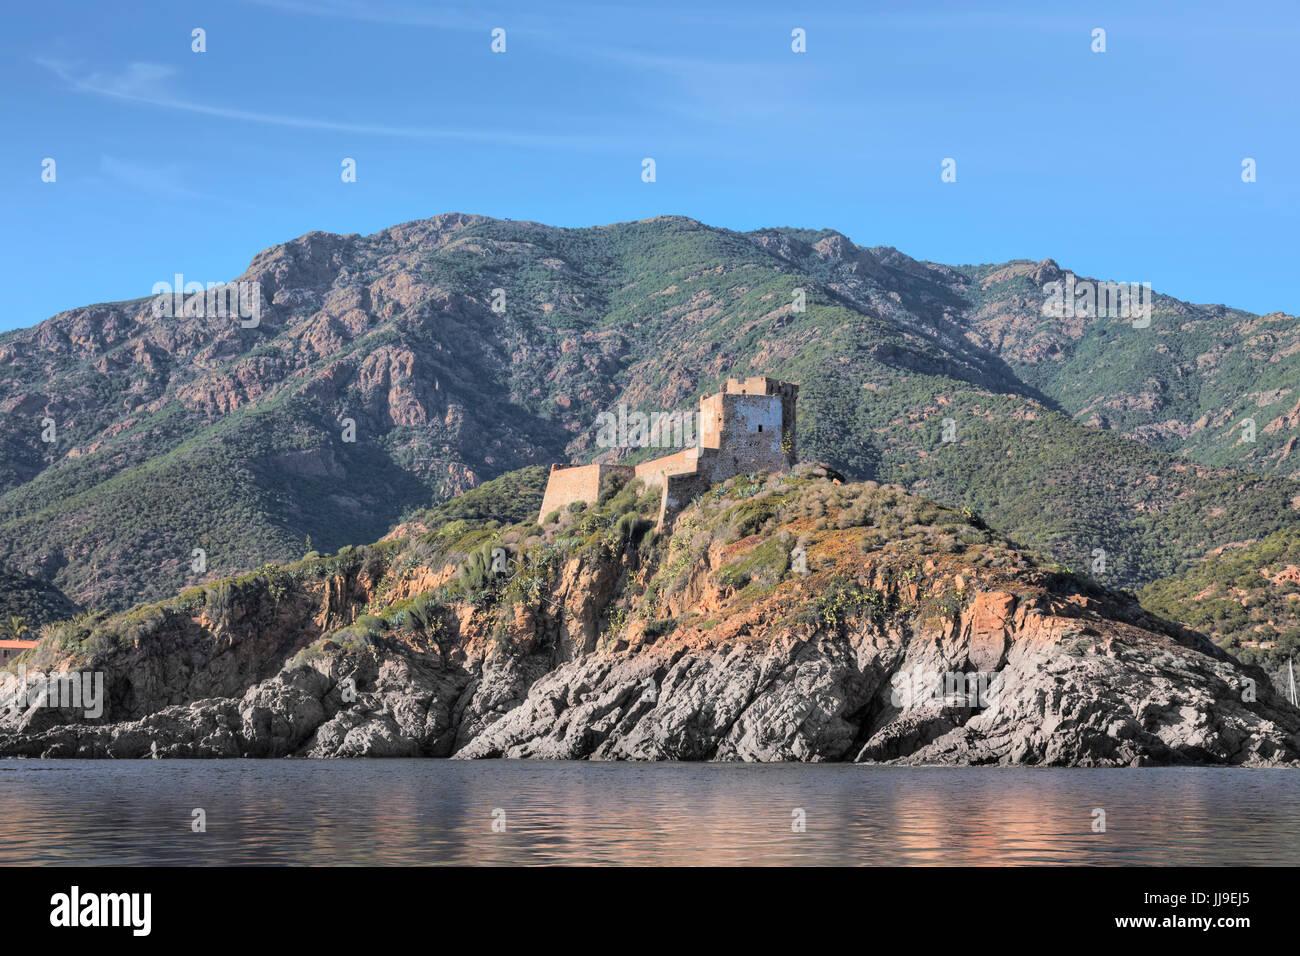 La tour de Girolata, Scandola, réserve naturelle, Porto, Corse, France Photo Stock